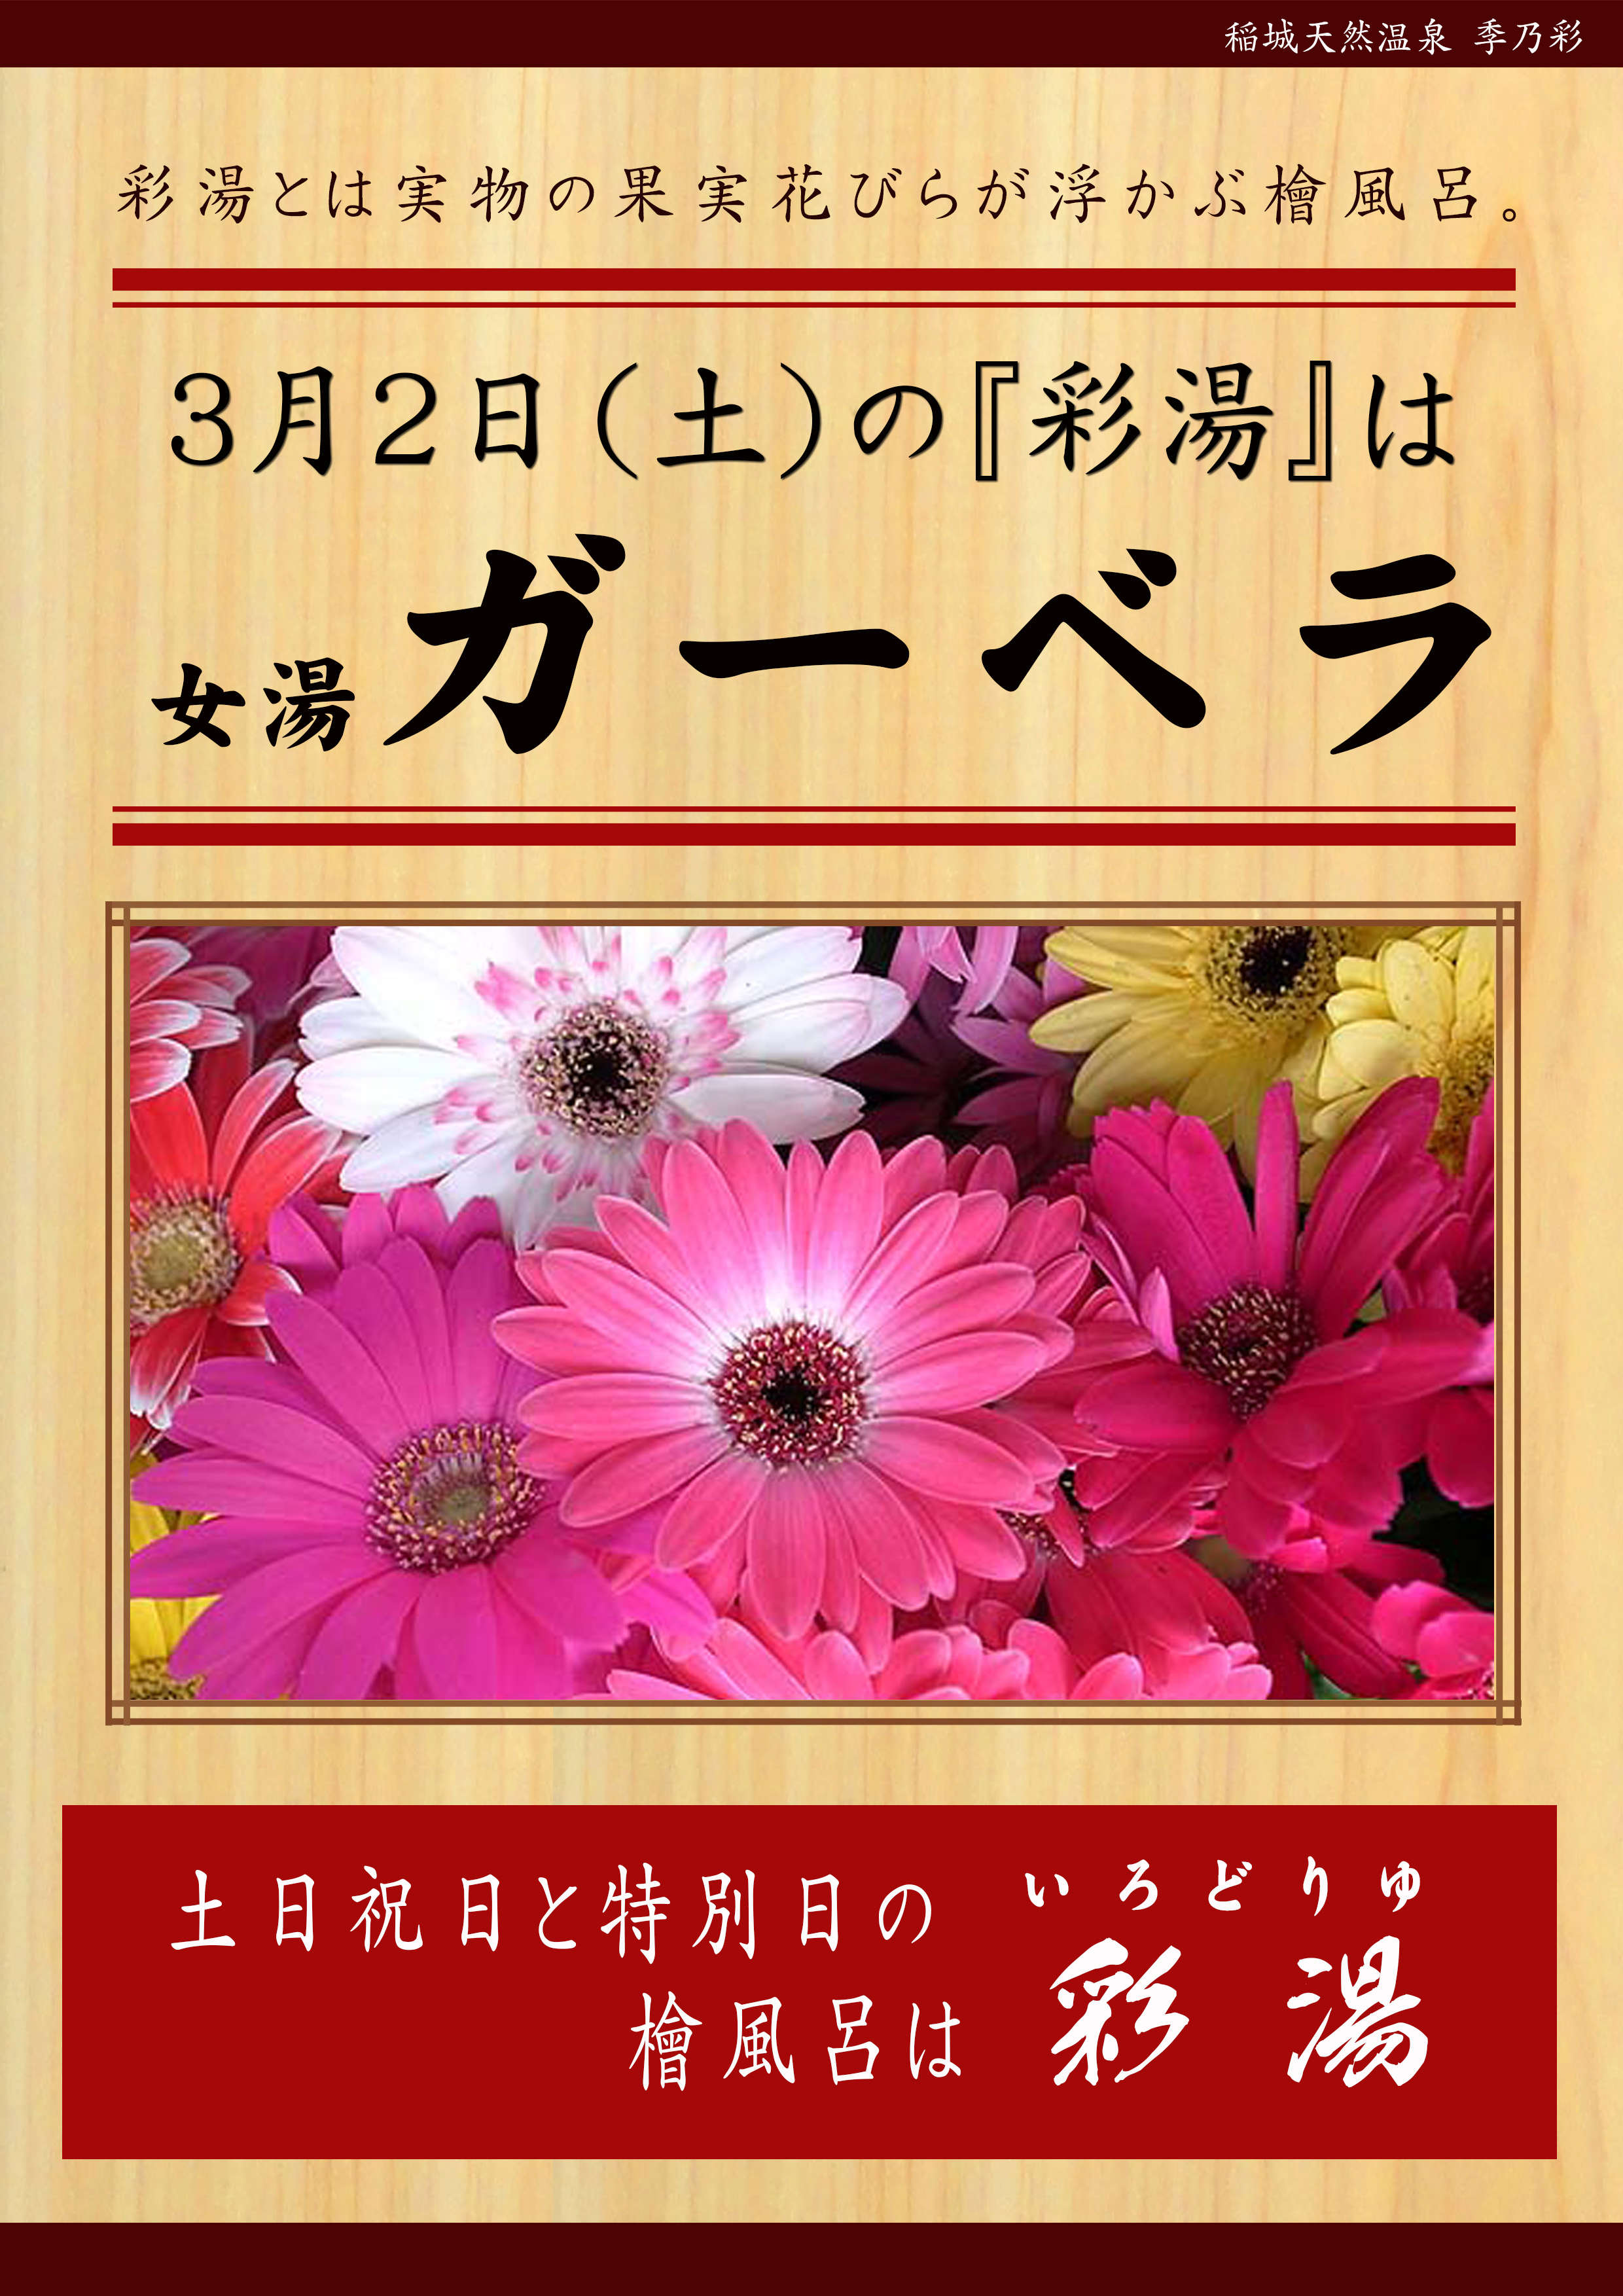 20190302POP イベント 彩湯 女湯 ガーベラ